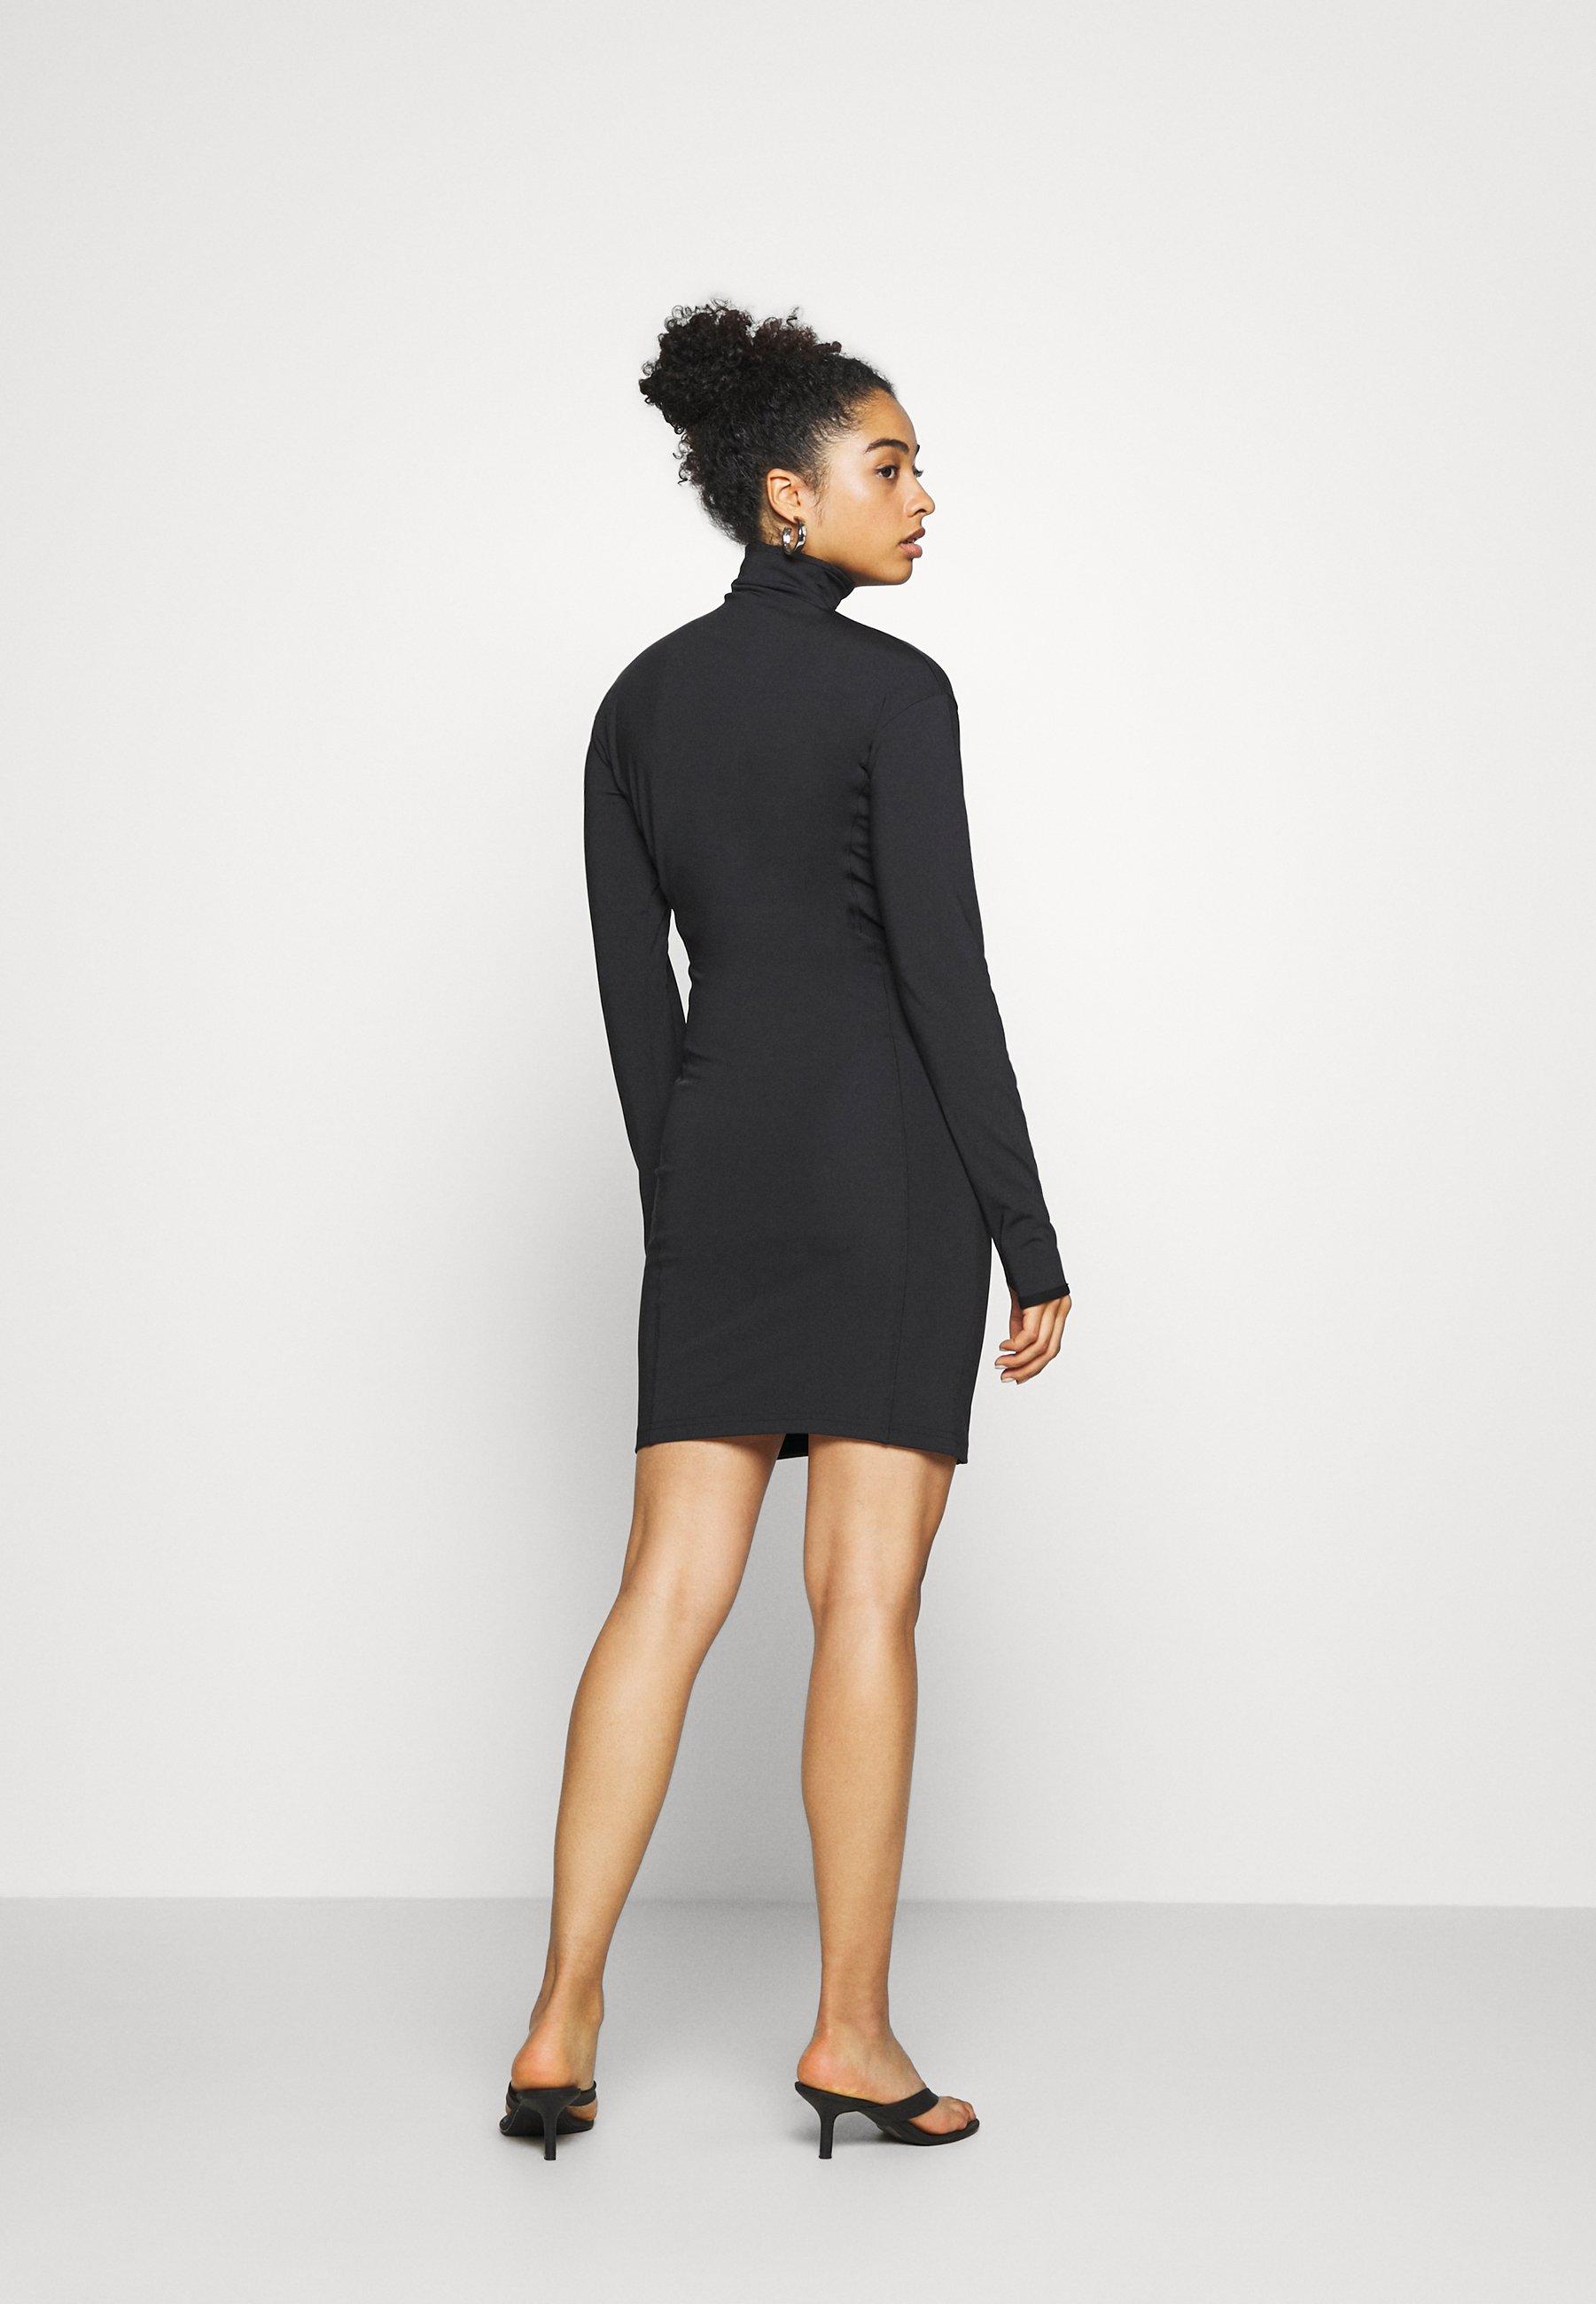 Big Sale Women's Clothing H2O Fagerholt DRESS ME DRESS Jersey dress black prLOjKvsc